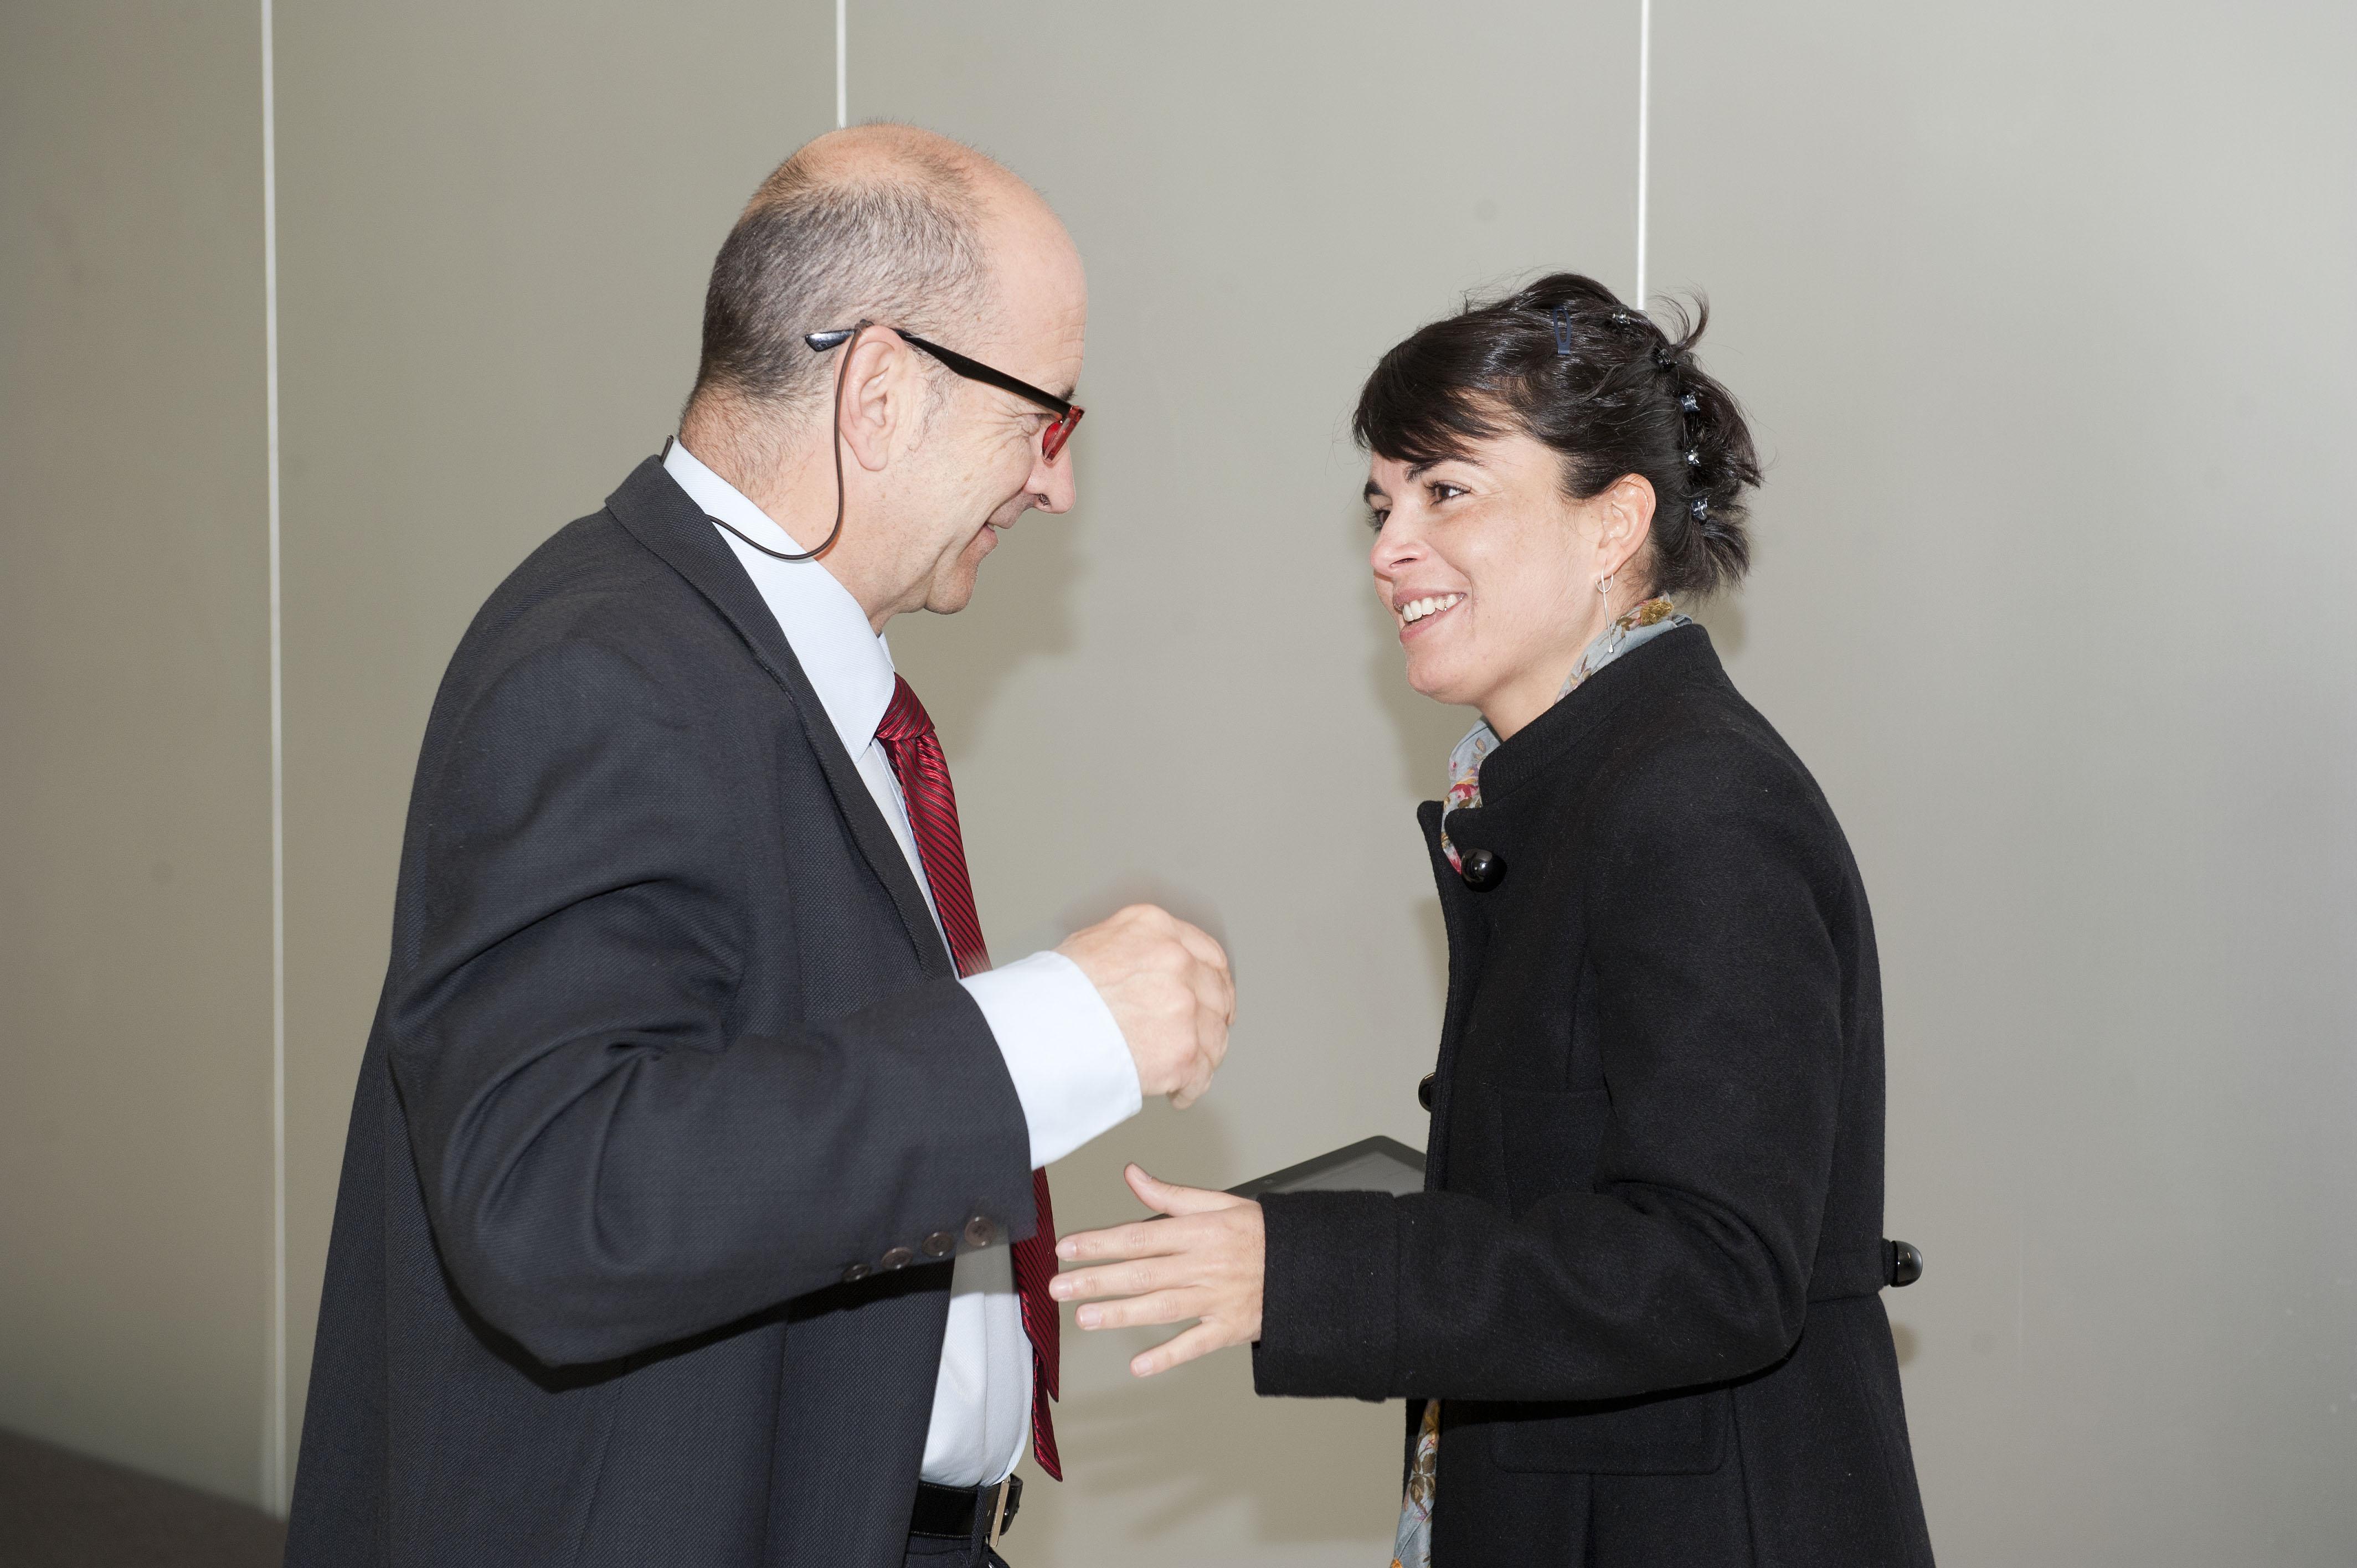 2012_03_12_congreso_ciudadania_digital_02.jpg